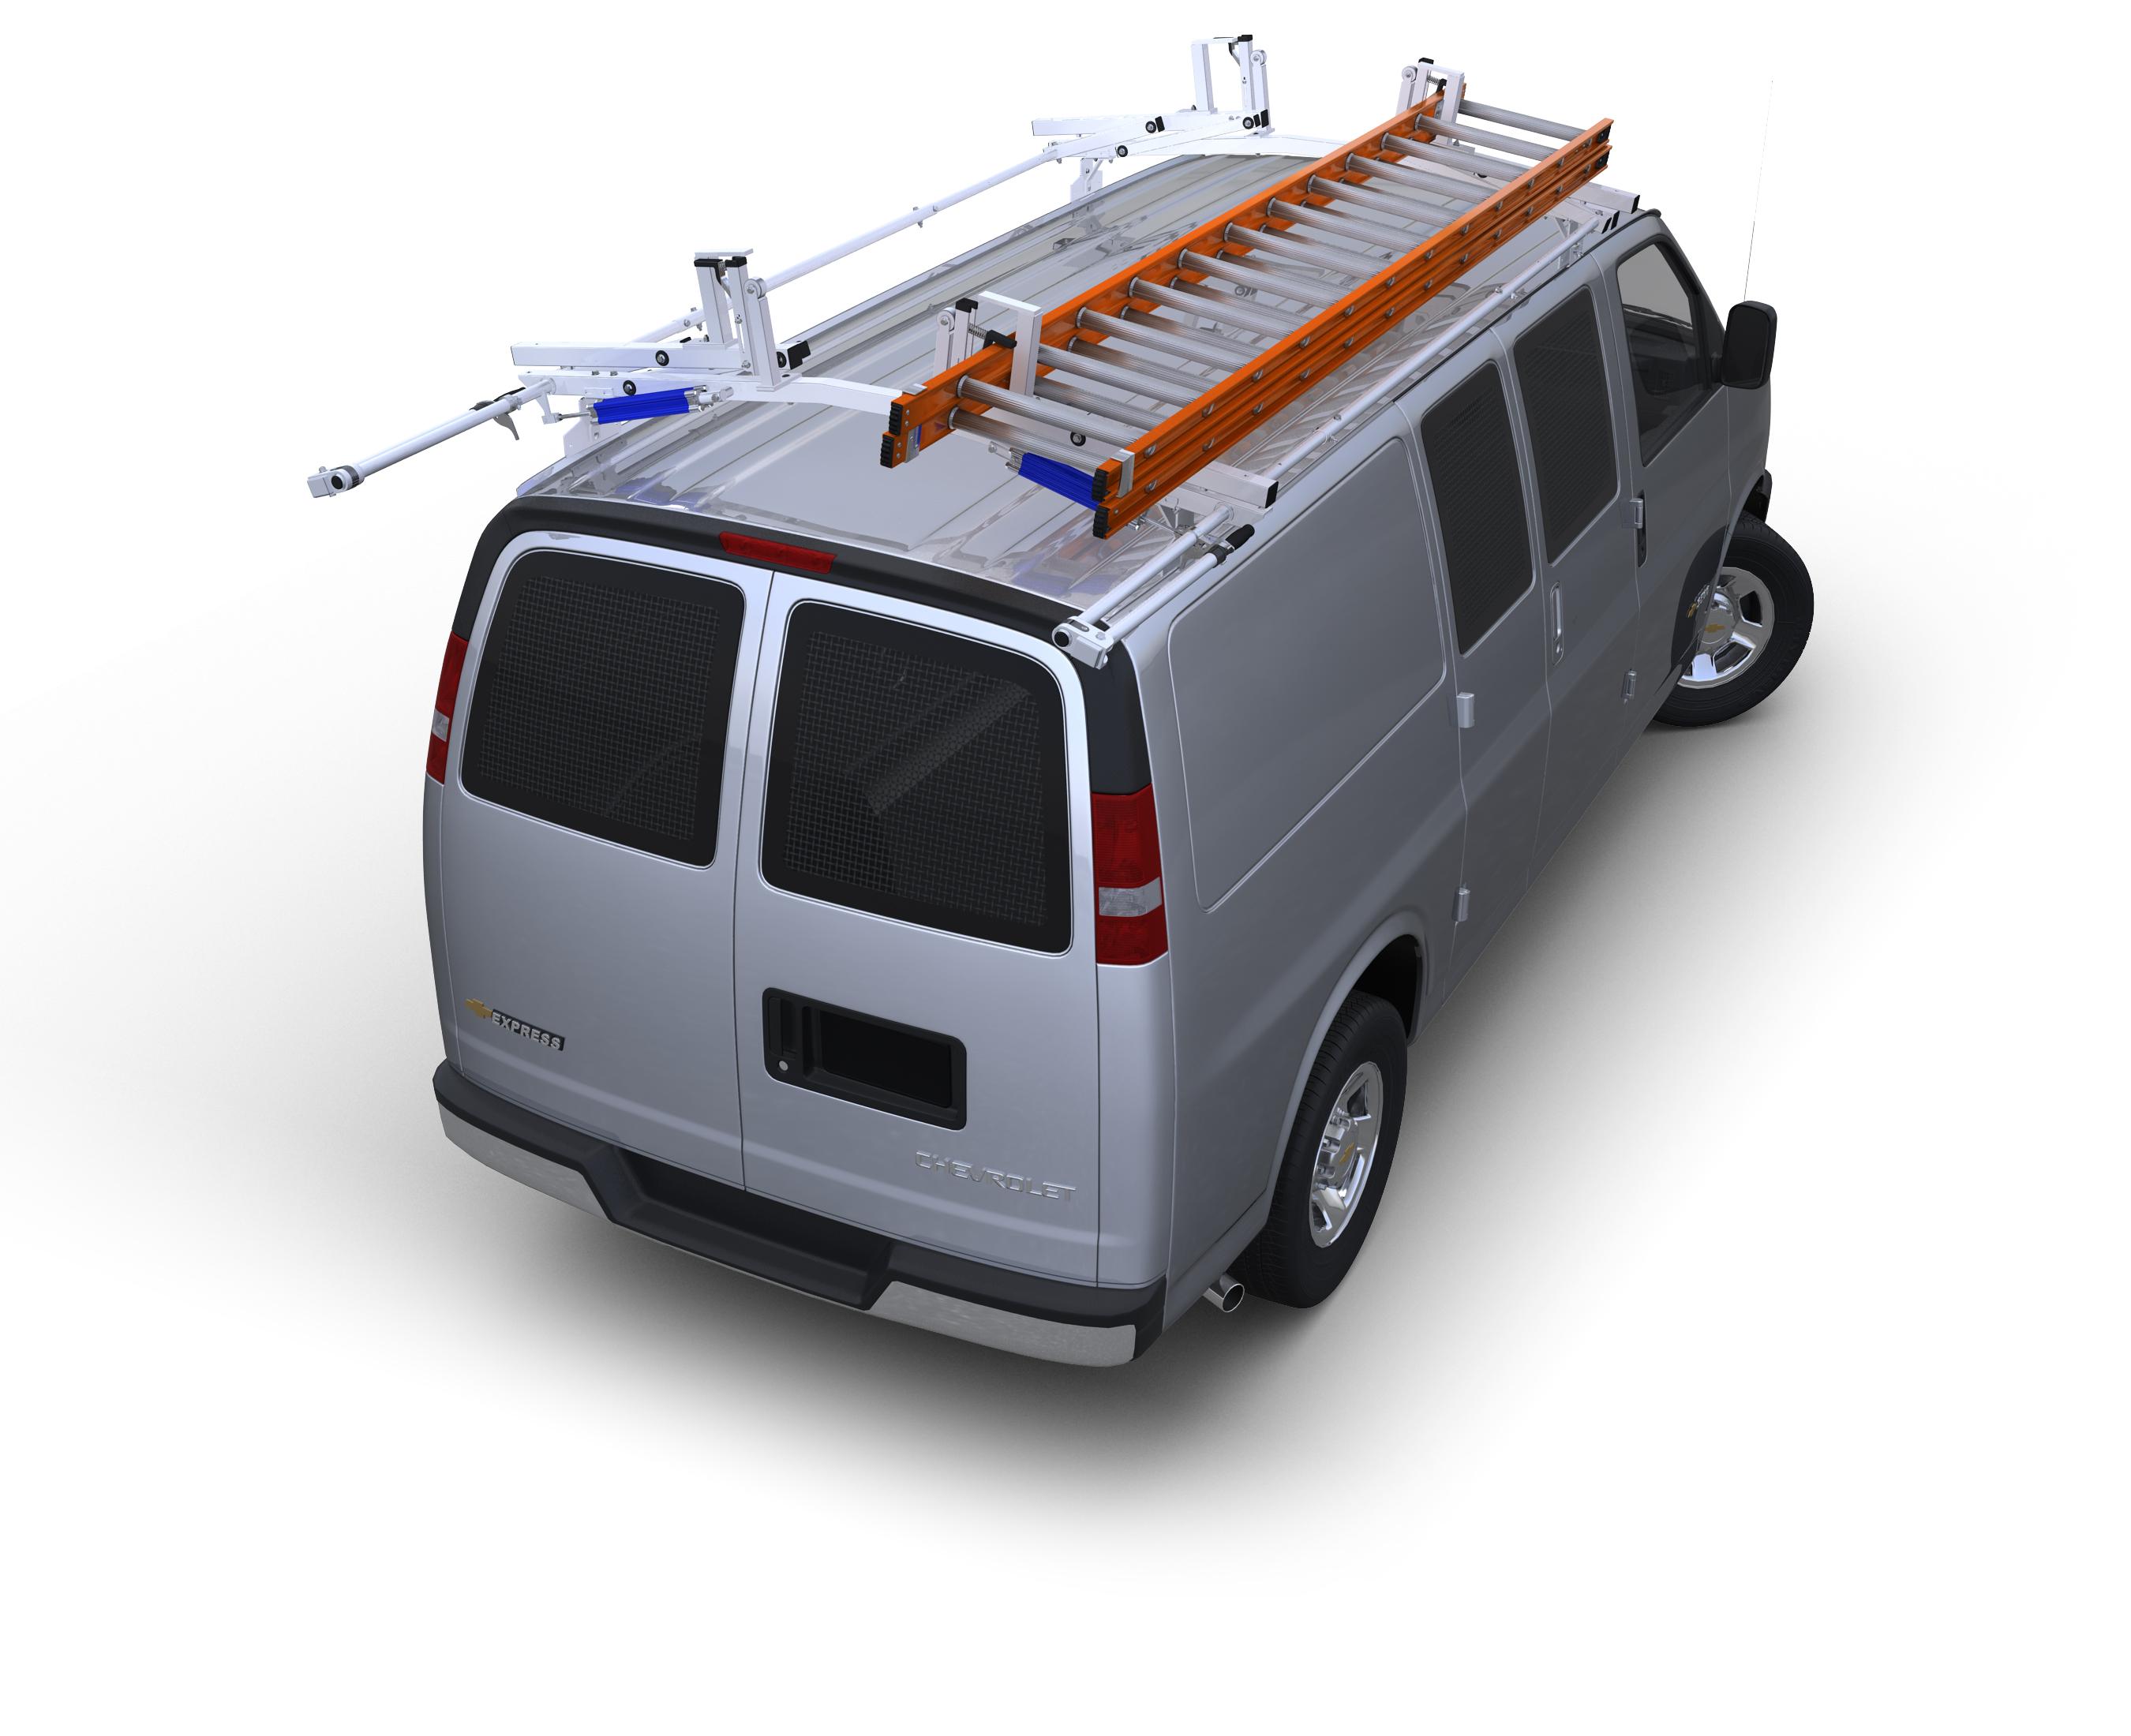 Prime Design's DeployPro for Pick Up Trucks